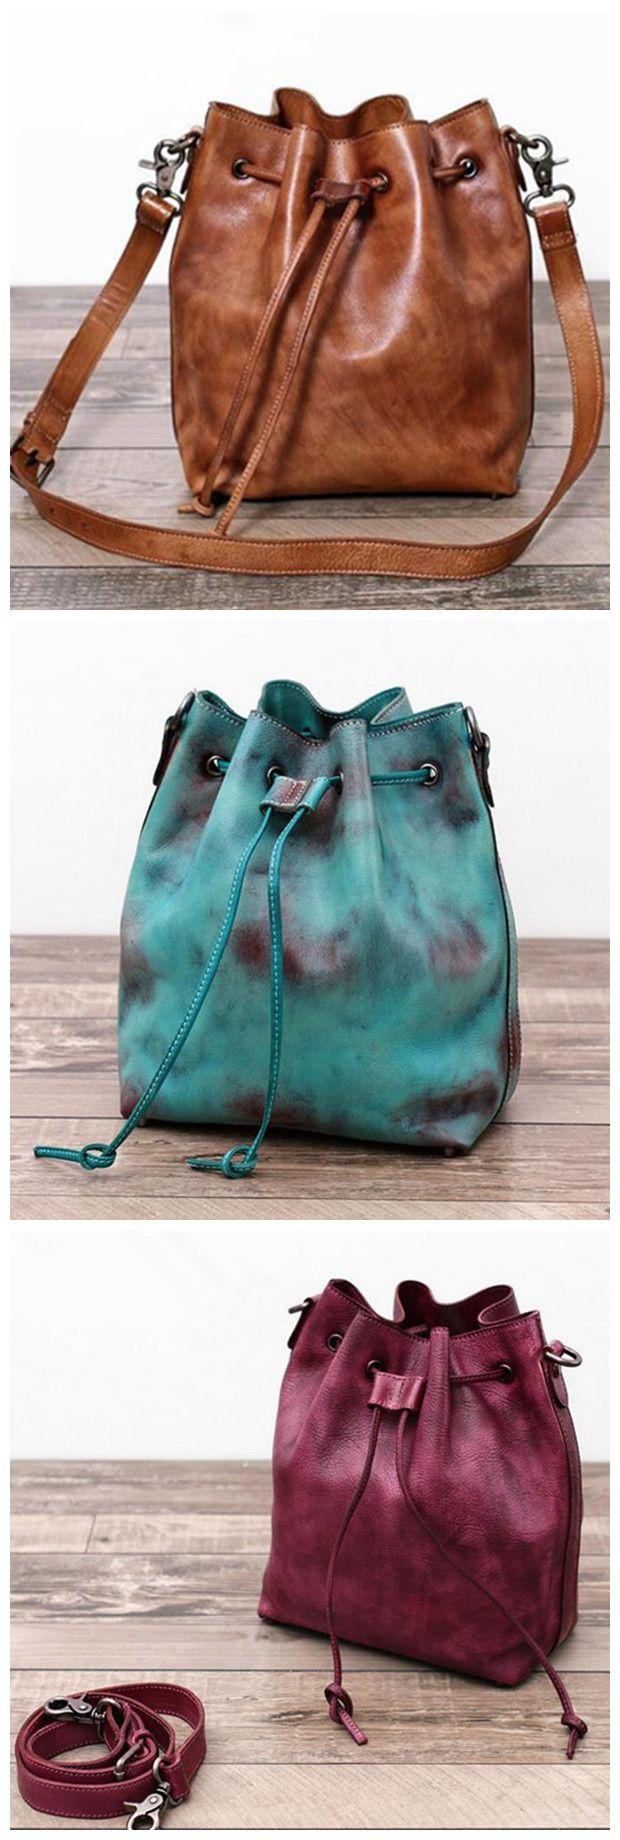 7 Best Purses Mini Backpacks Images On Pinterest Bags Nucelle Women Leather Purse Satchel Shoulder Bag Handbag Lock Gorgeous Glitter Elegant Blue Genuine Messenger Cross Body Bucket